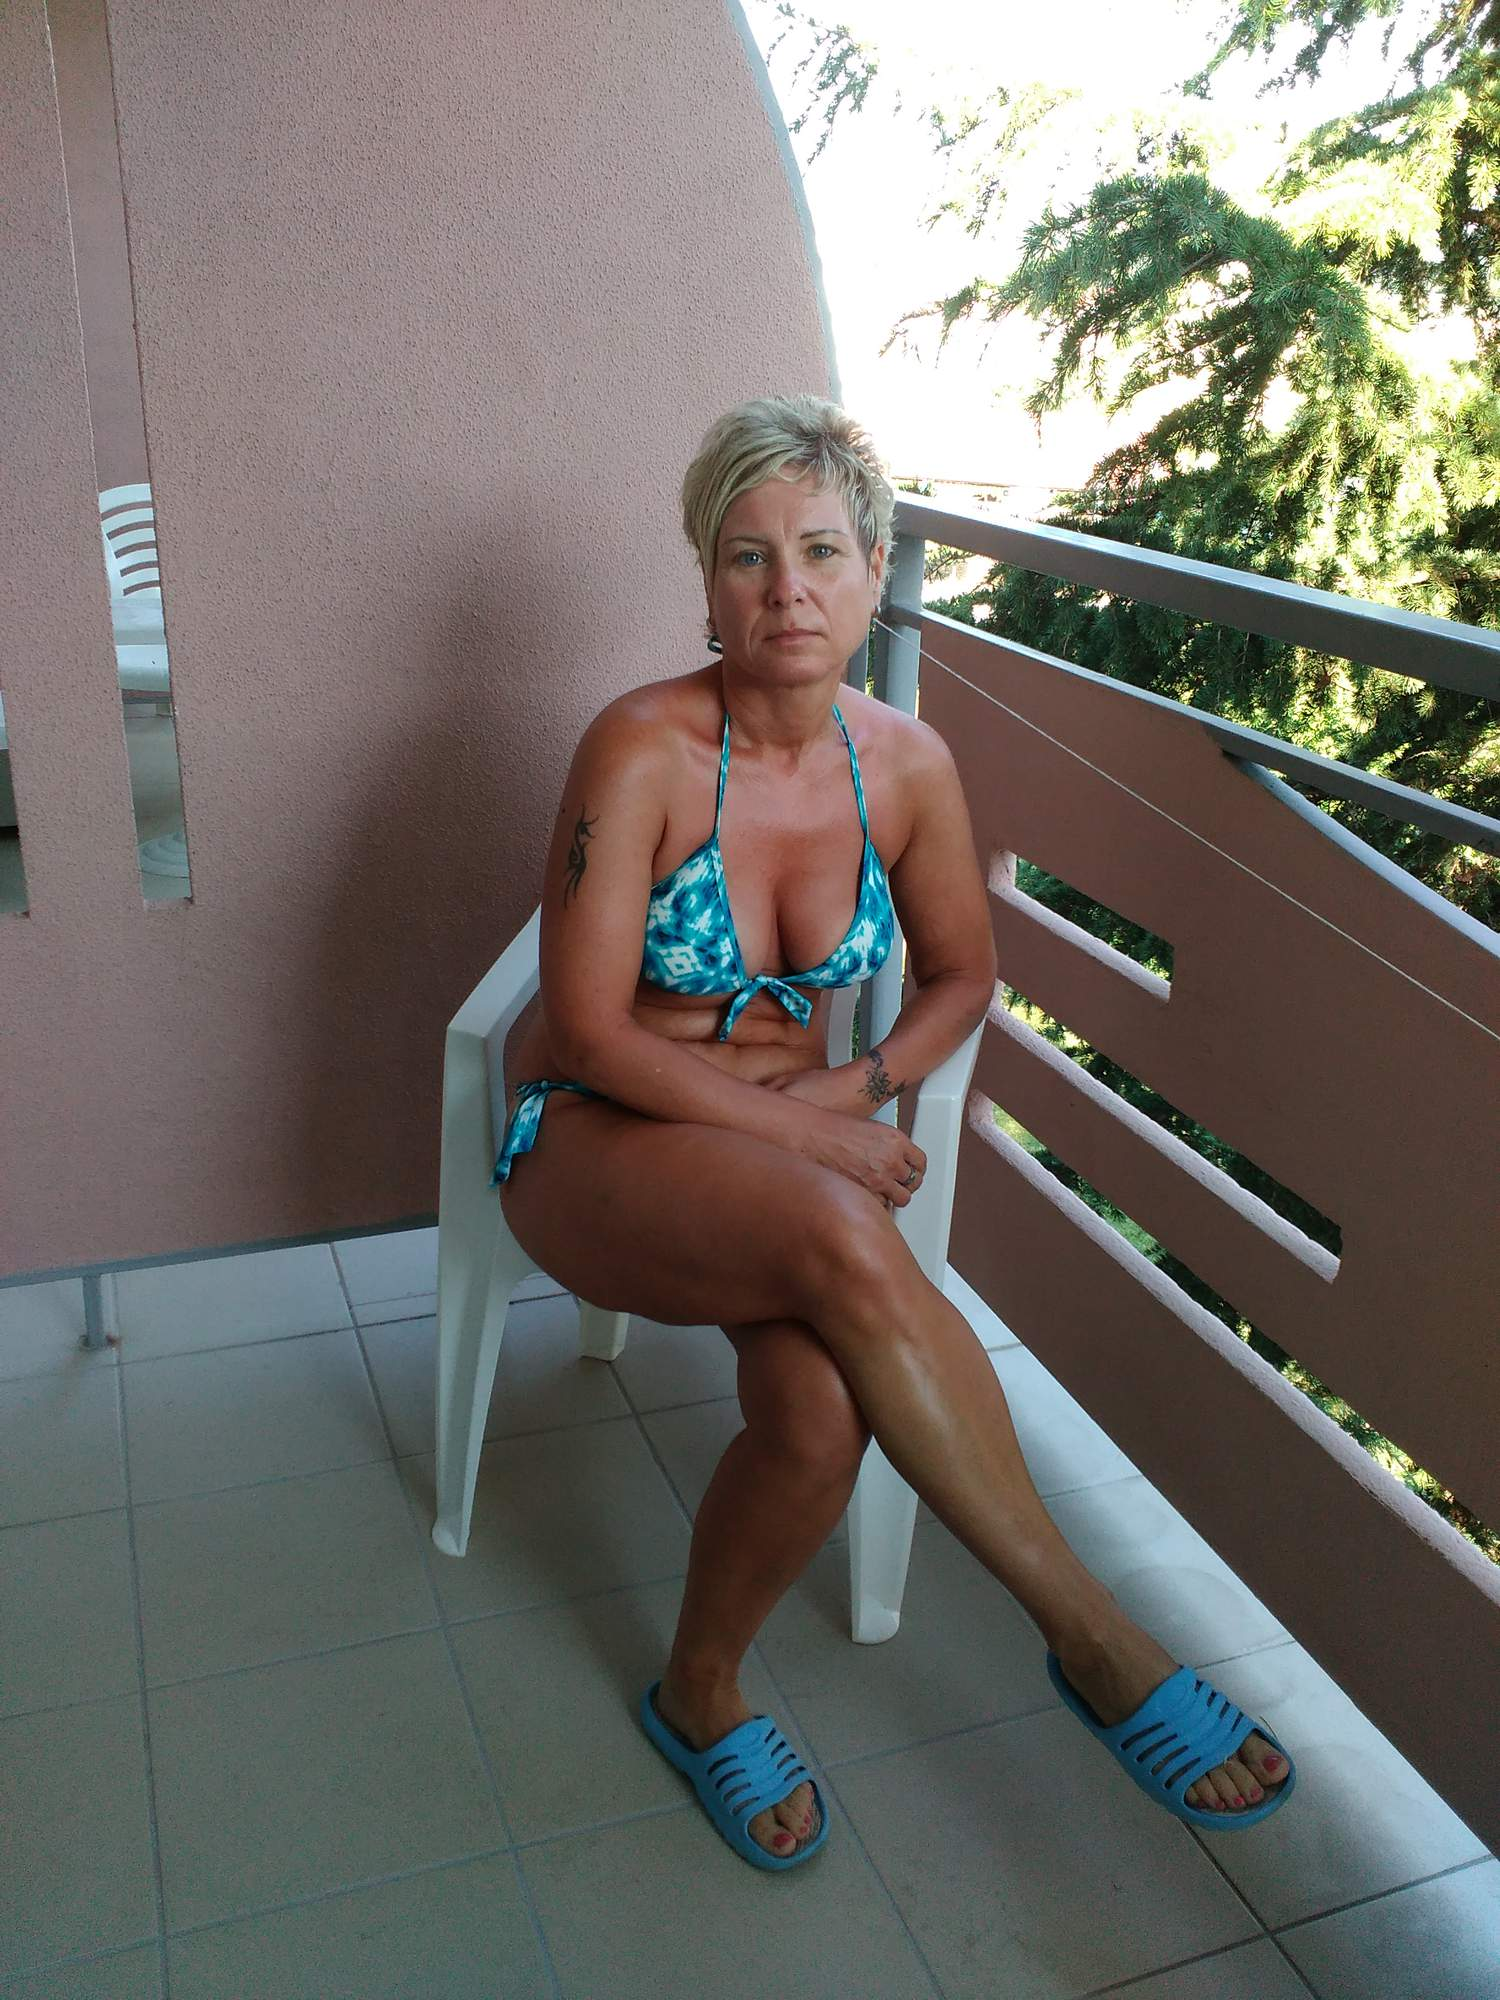 http://img25.rajce.idnes.cz/d2502/14/14660/14660196_9f28440ac985ba1fcc32e6bdf80e4ecf/images/foto_telefon_m_297.jpg